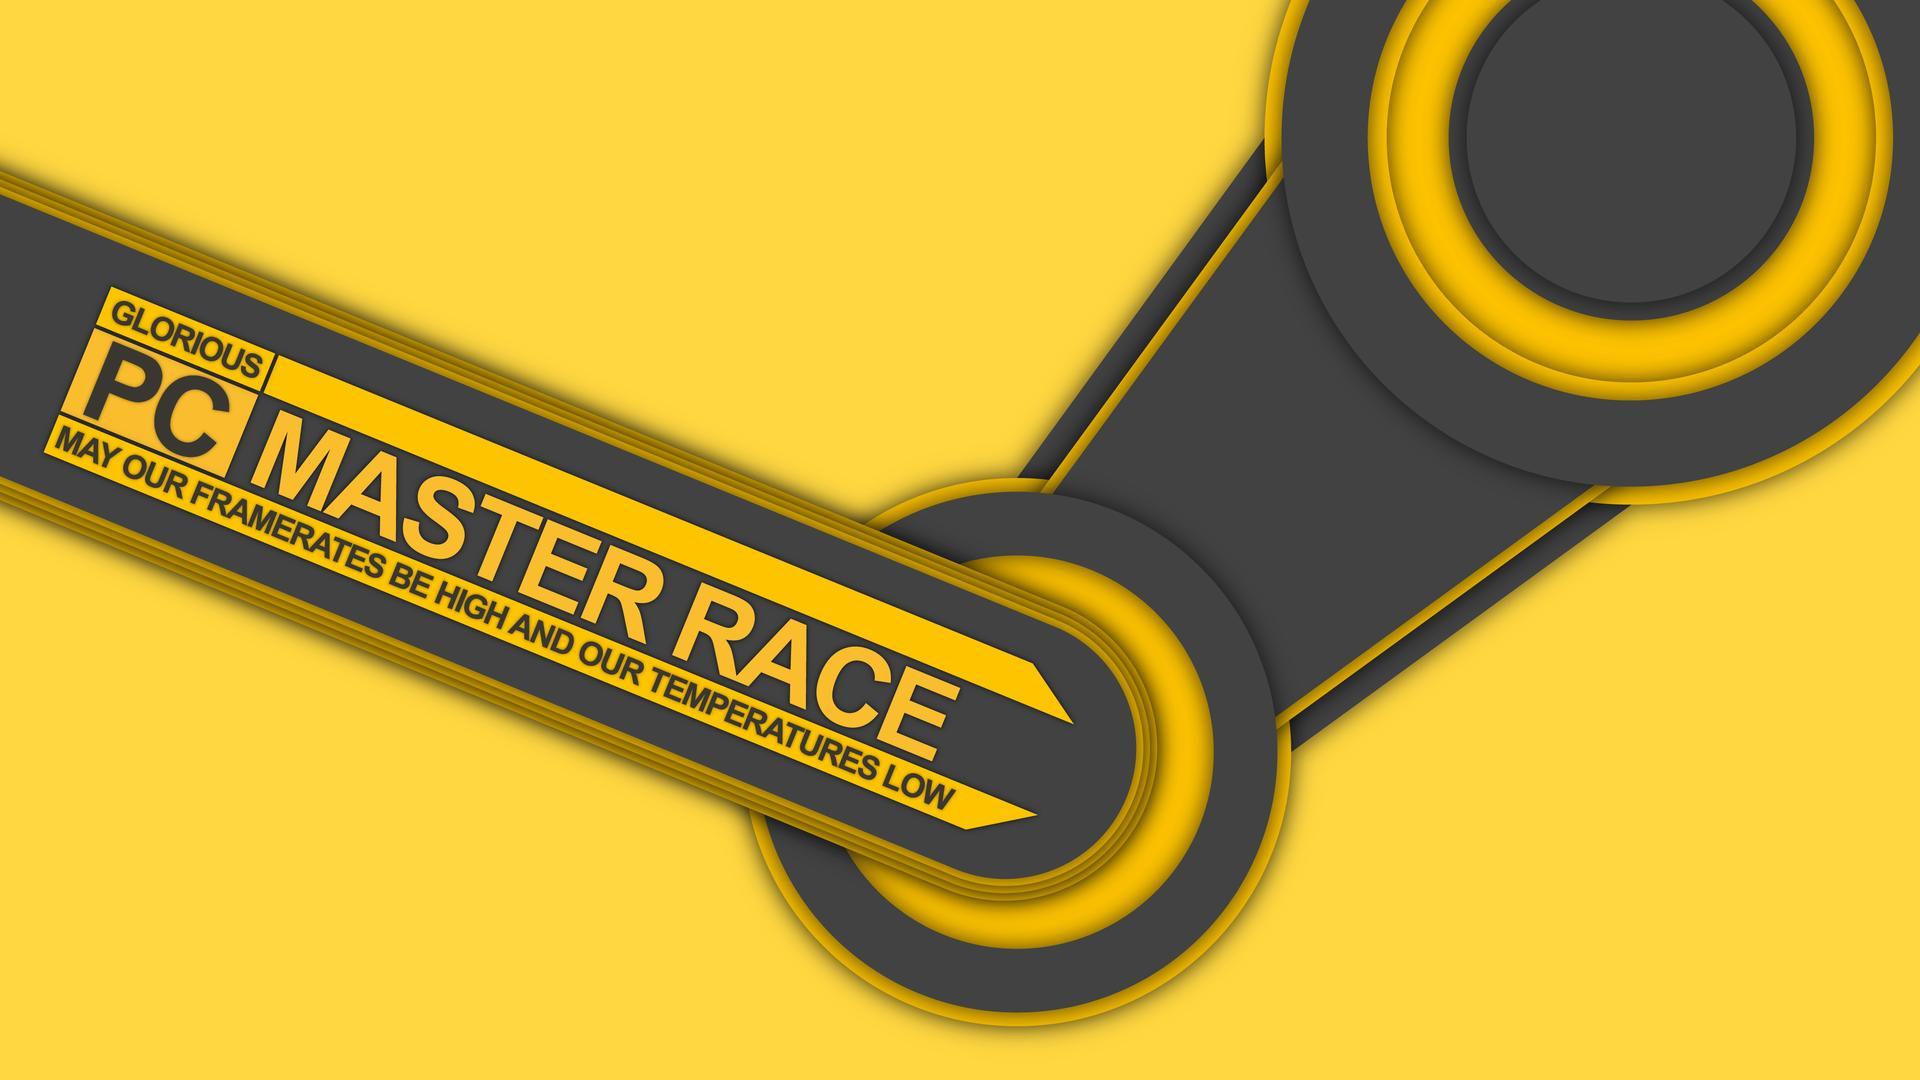 Gaming PC Master Race Wallpaper Wallpaper Download 1920x1080